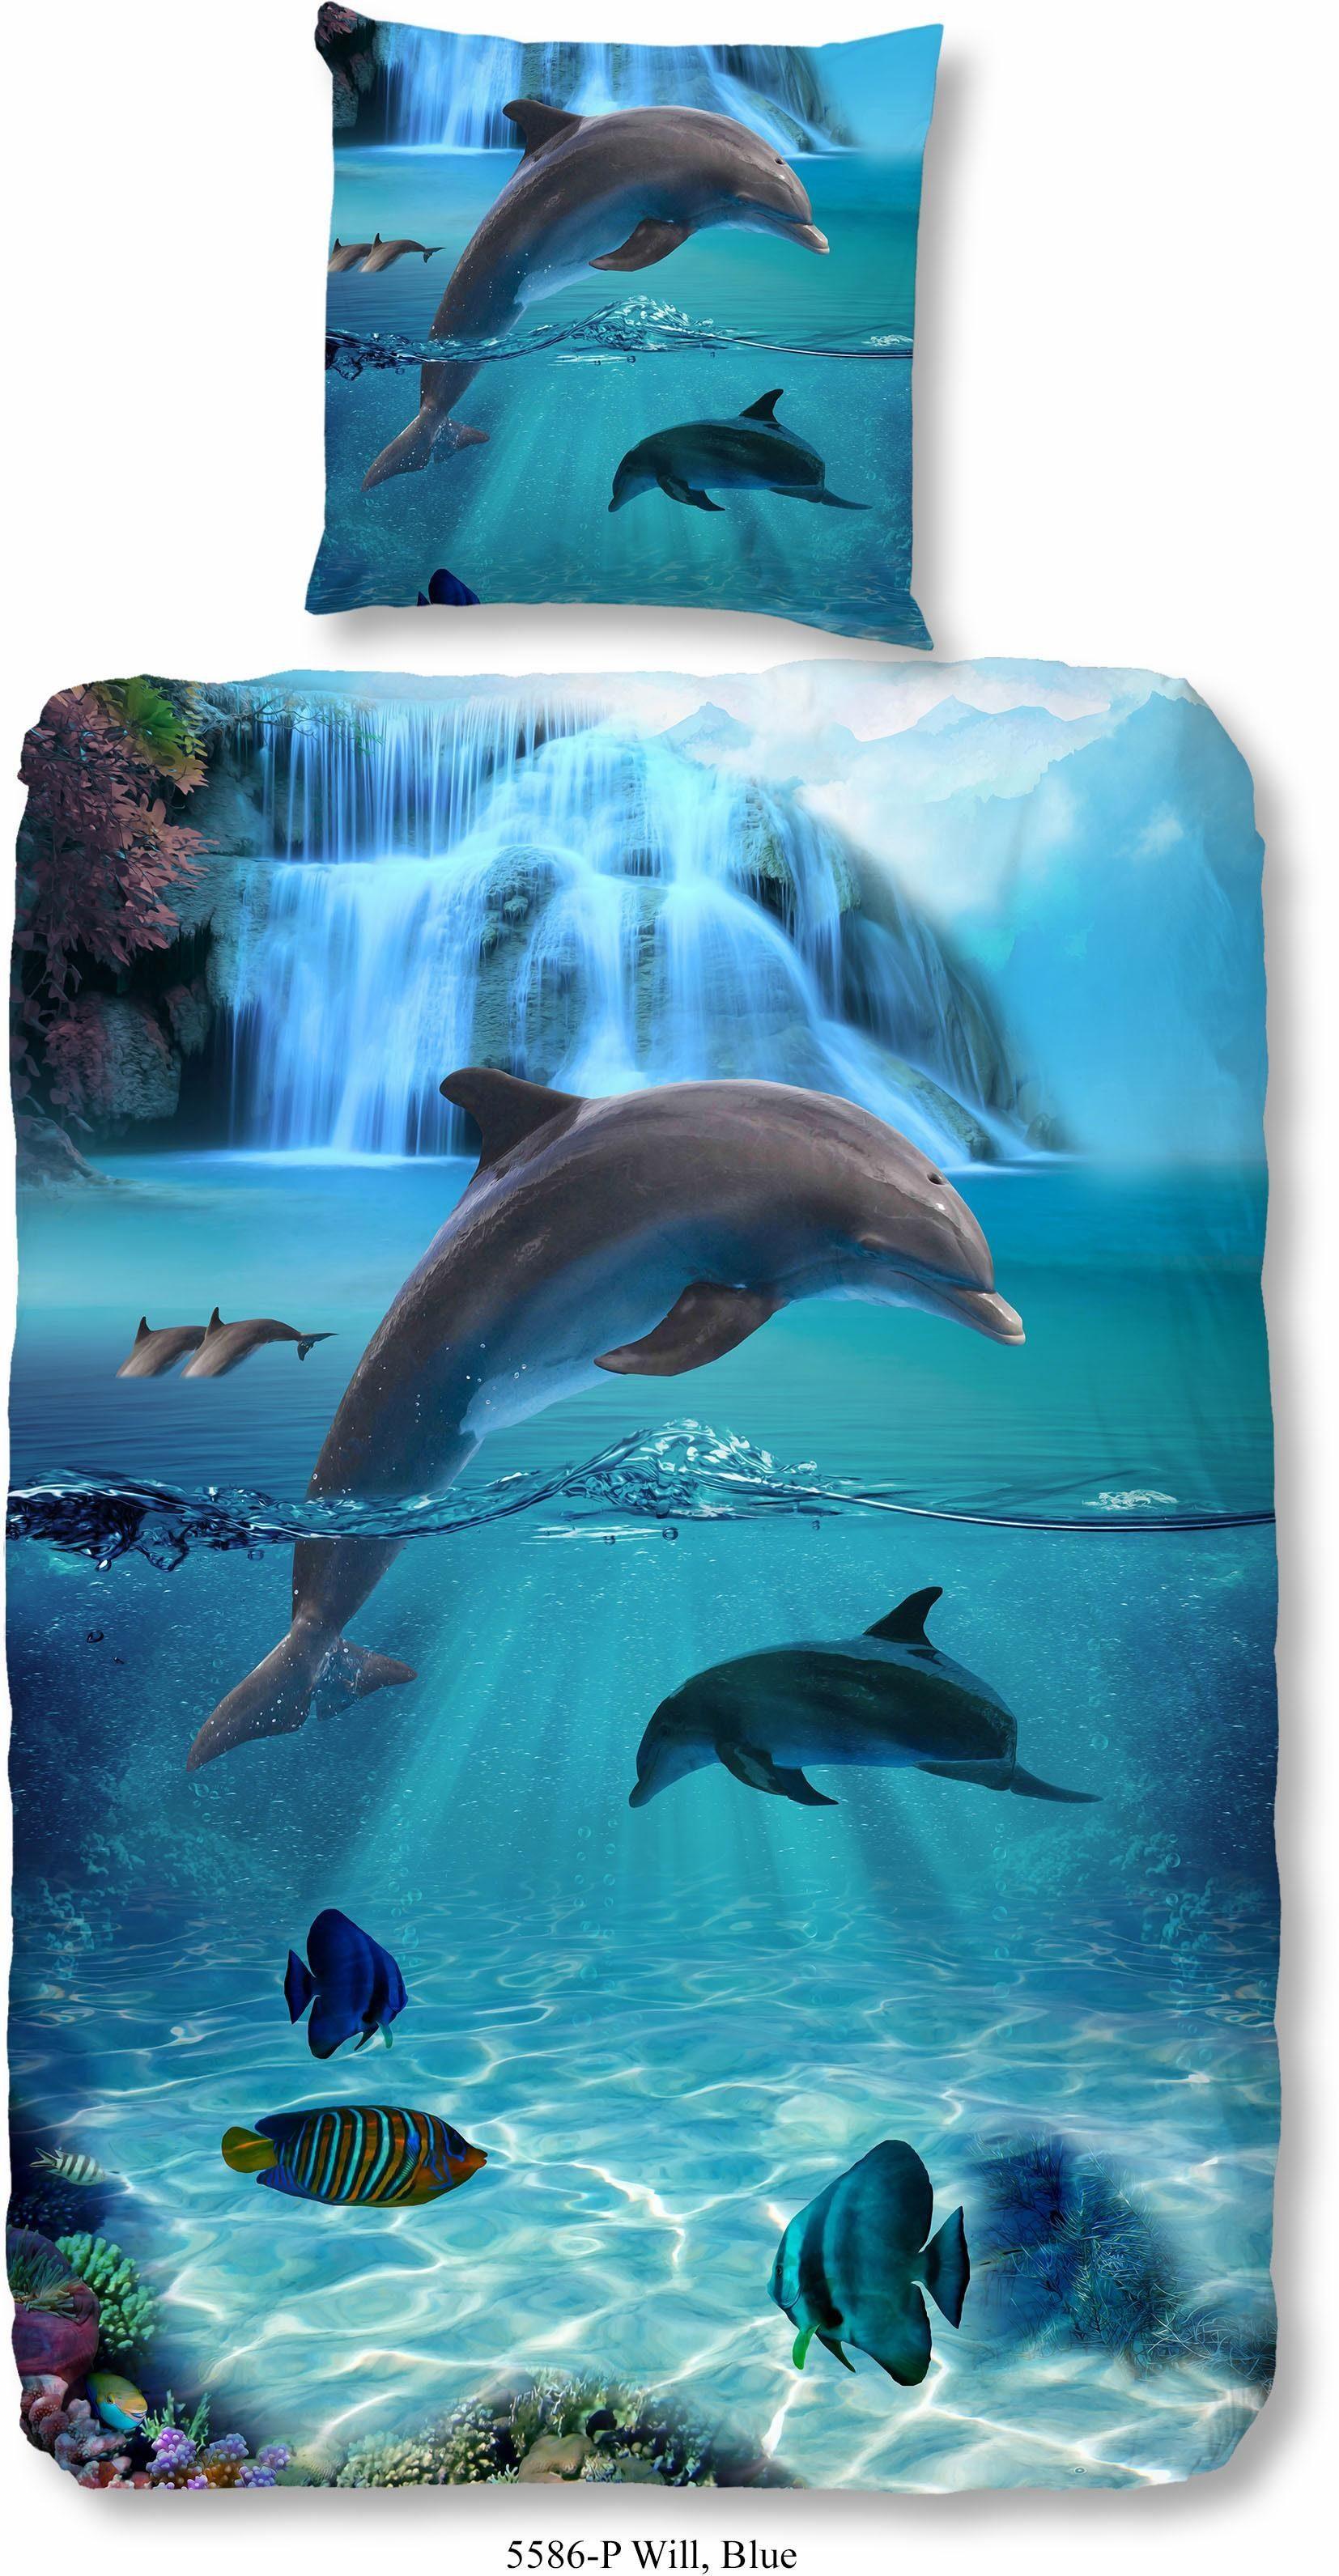 Kinderbettwäsche, Good Morning, »Flipper«, mit Delfinmotiv